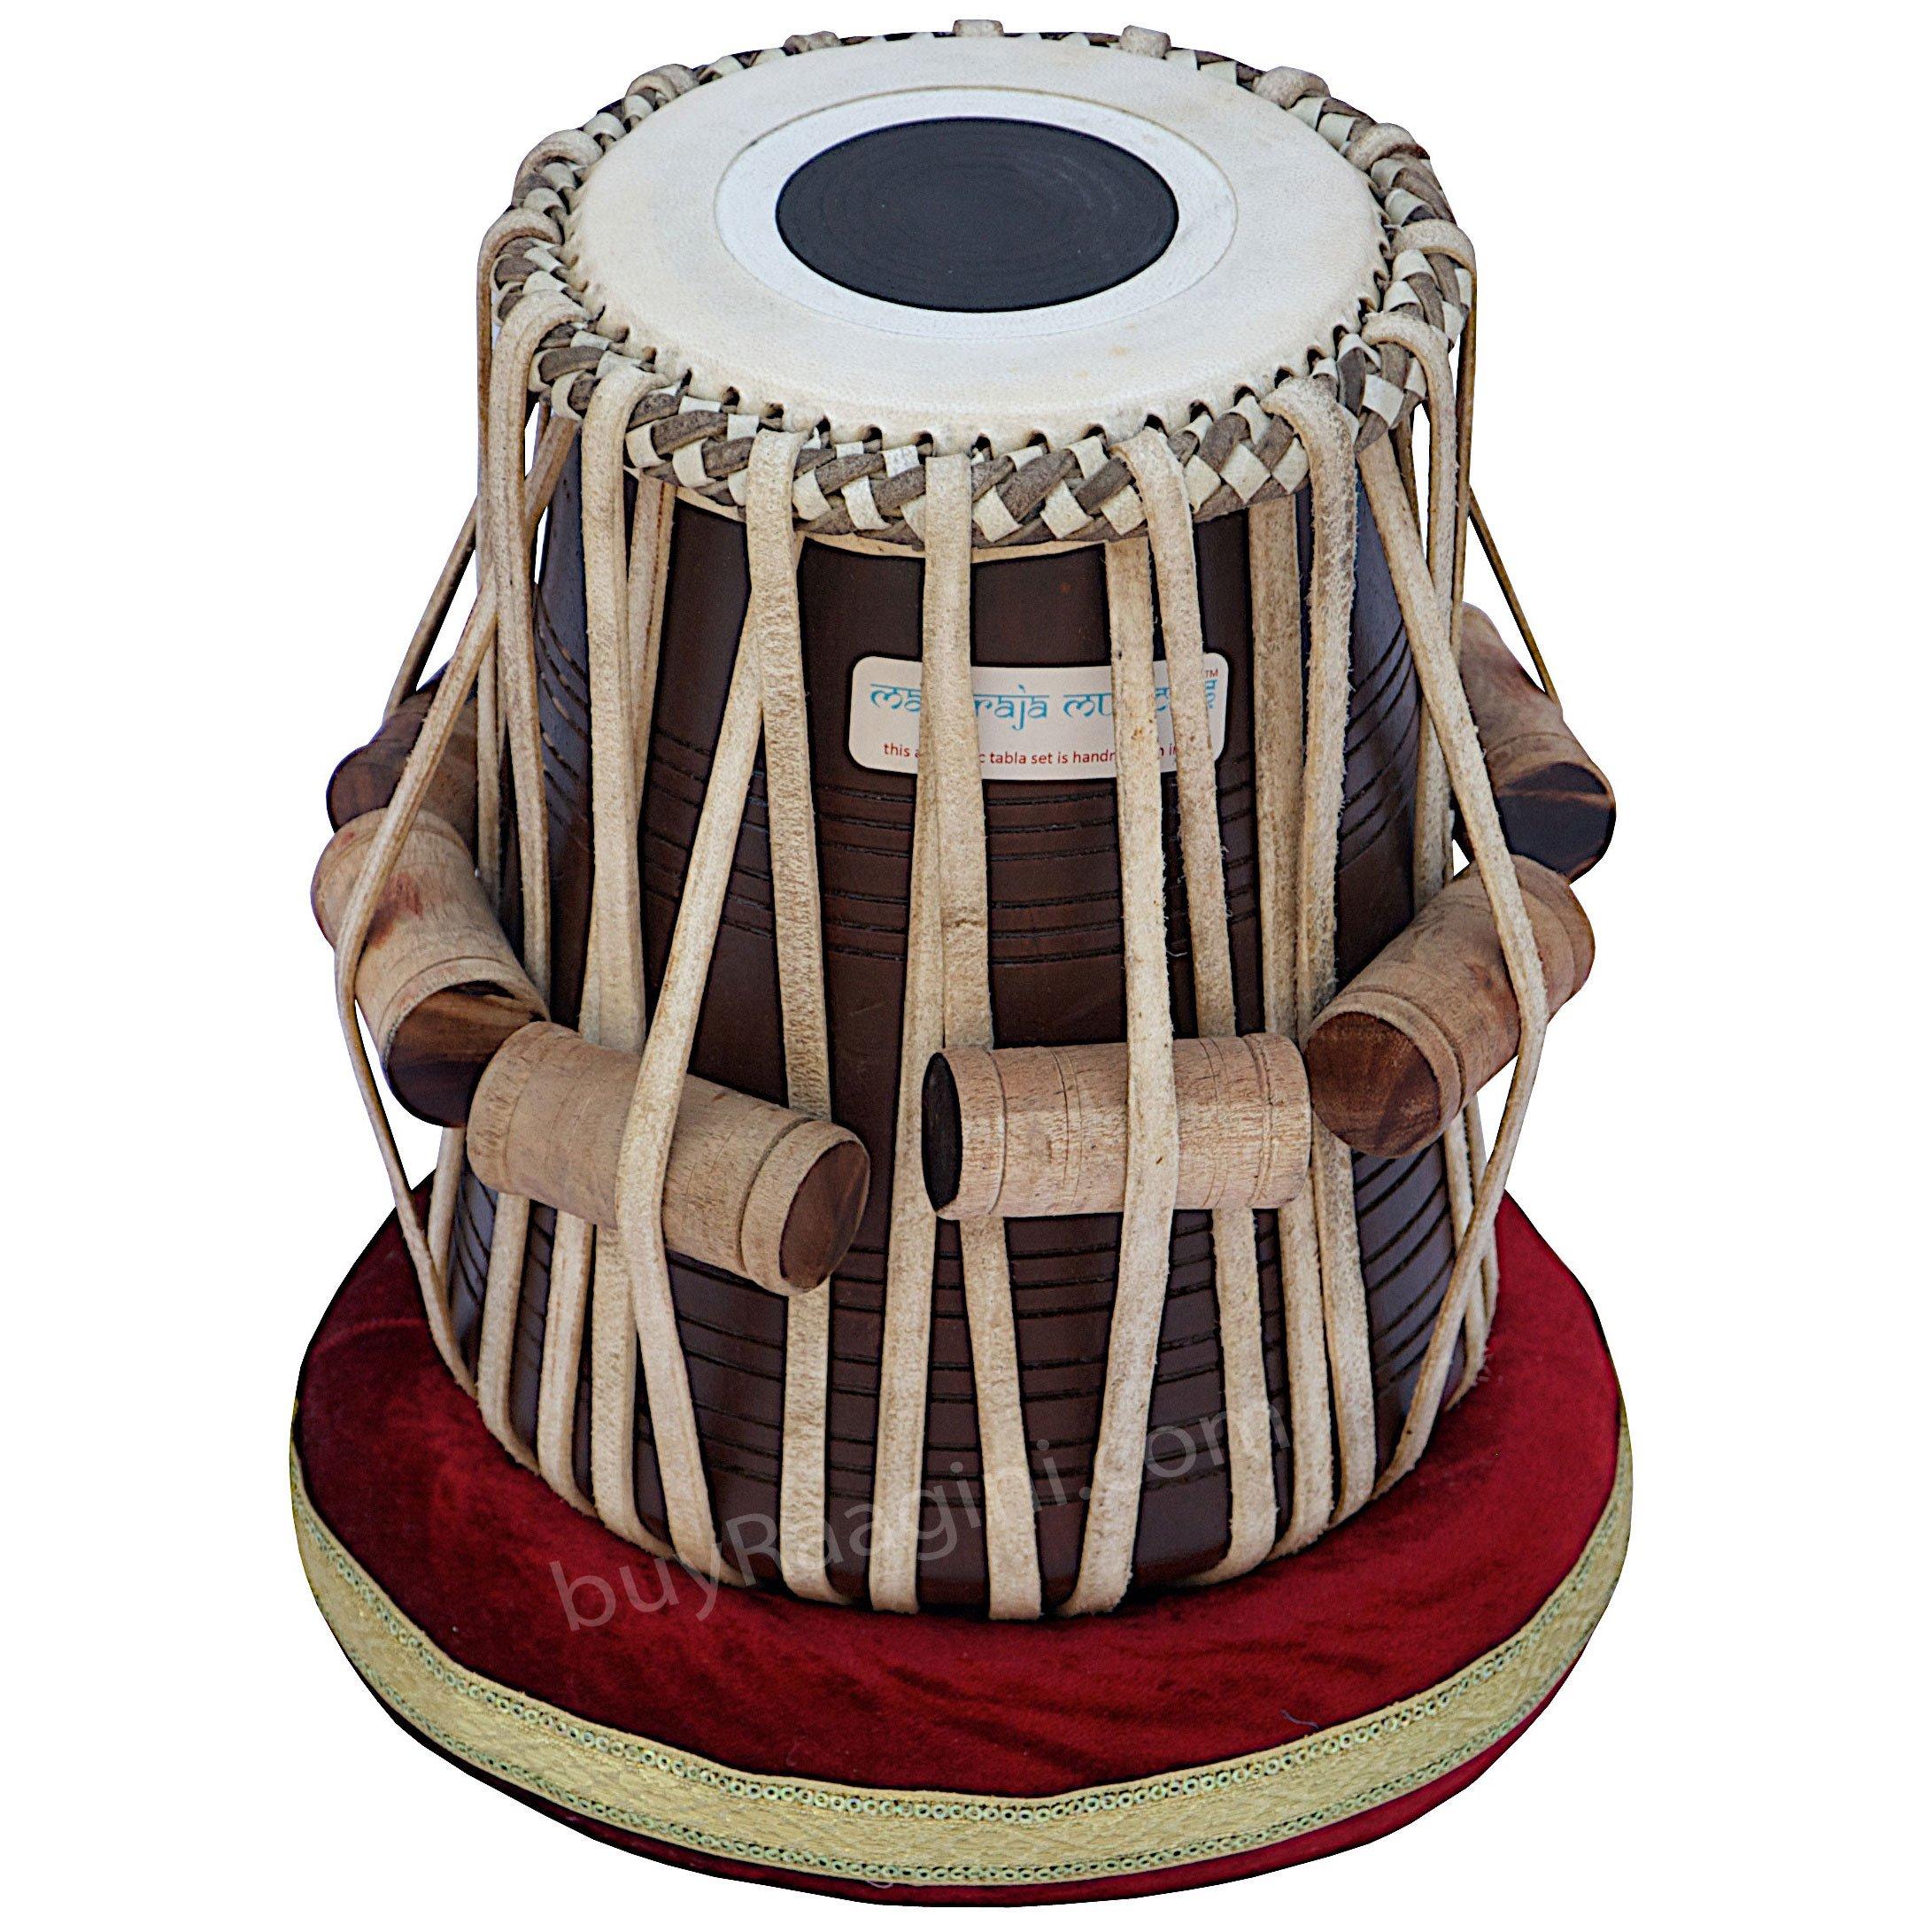 Tabla Set, Maharaja Musicals, 3.5 Kg Designer Golden Brass Bayan, Sheesham Tabla Dayan, Professional Drums, Padded Bag, Book, Hammer, Cushions, Cover, Tabla Drums Indian (PDI-FG) by Maharaja Musicals (Image #4)